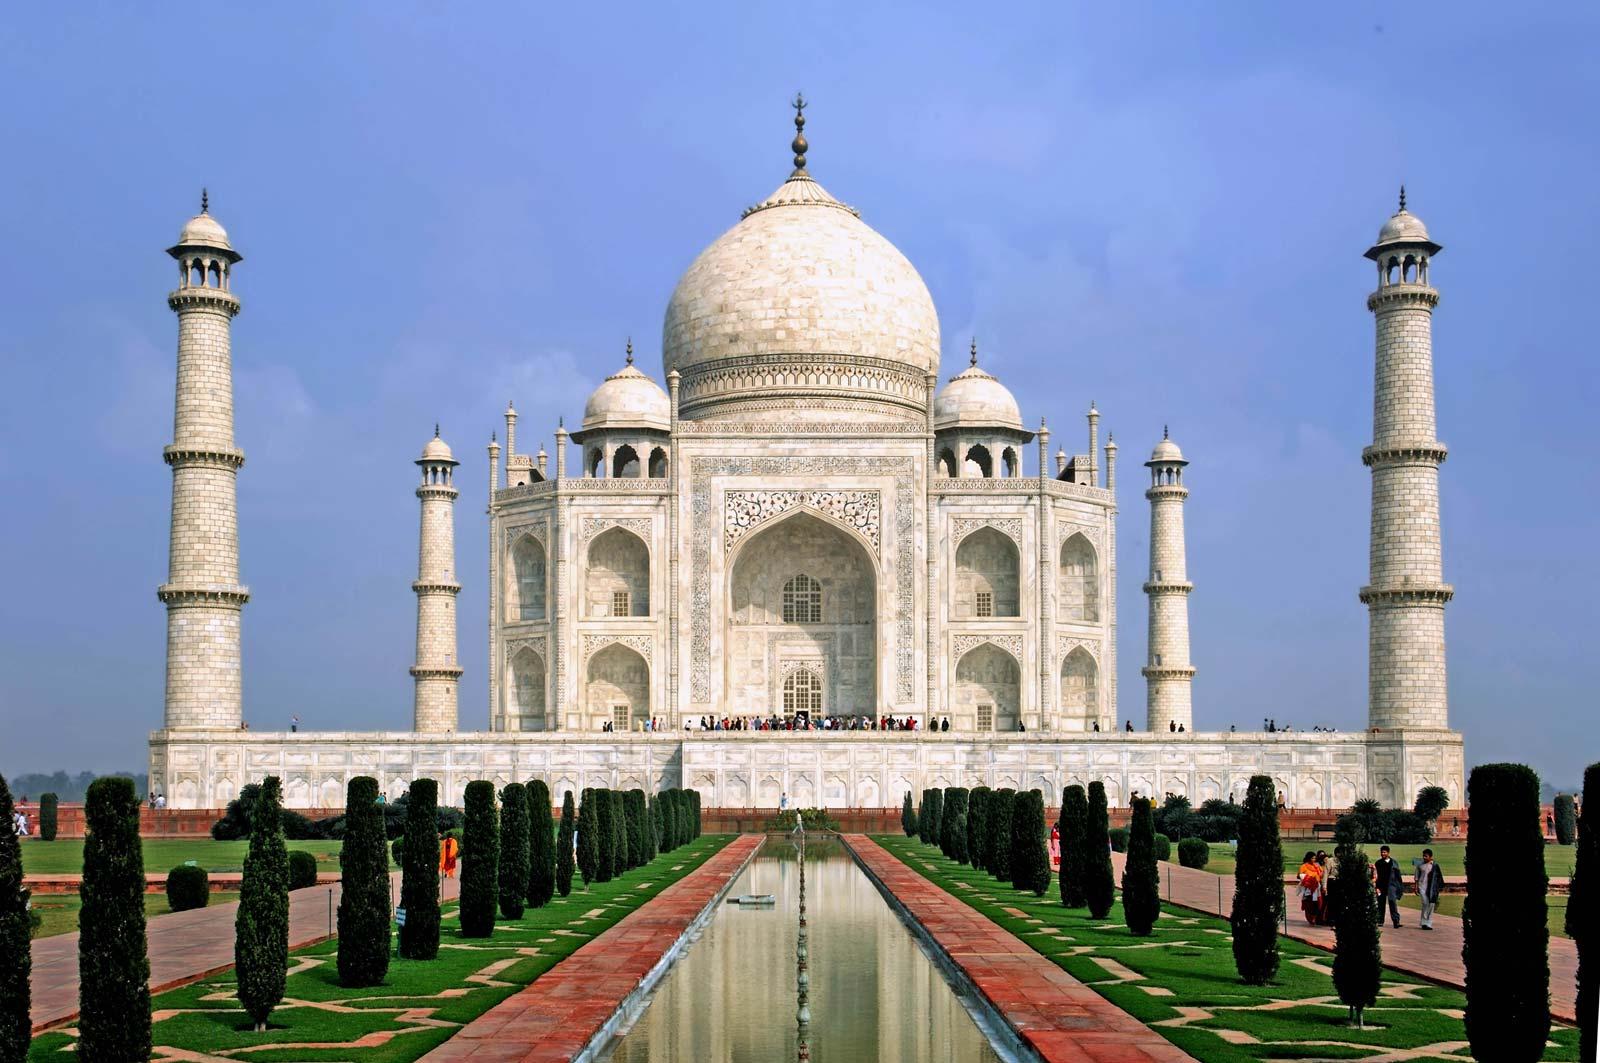 Taj Mahal reopens despite India's Covid-19 cases soaring